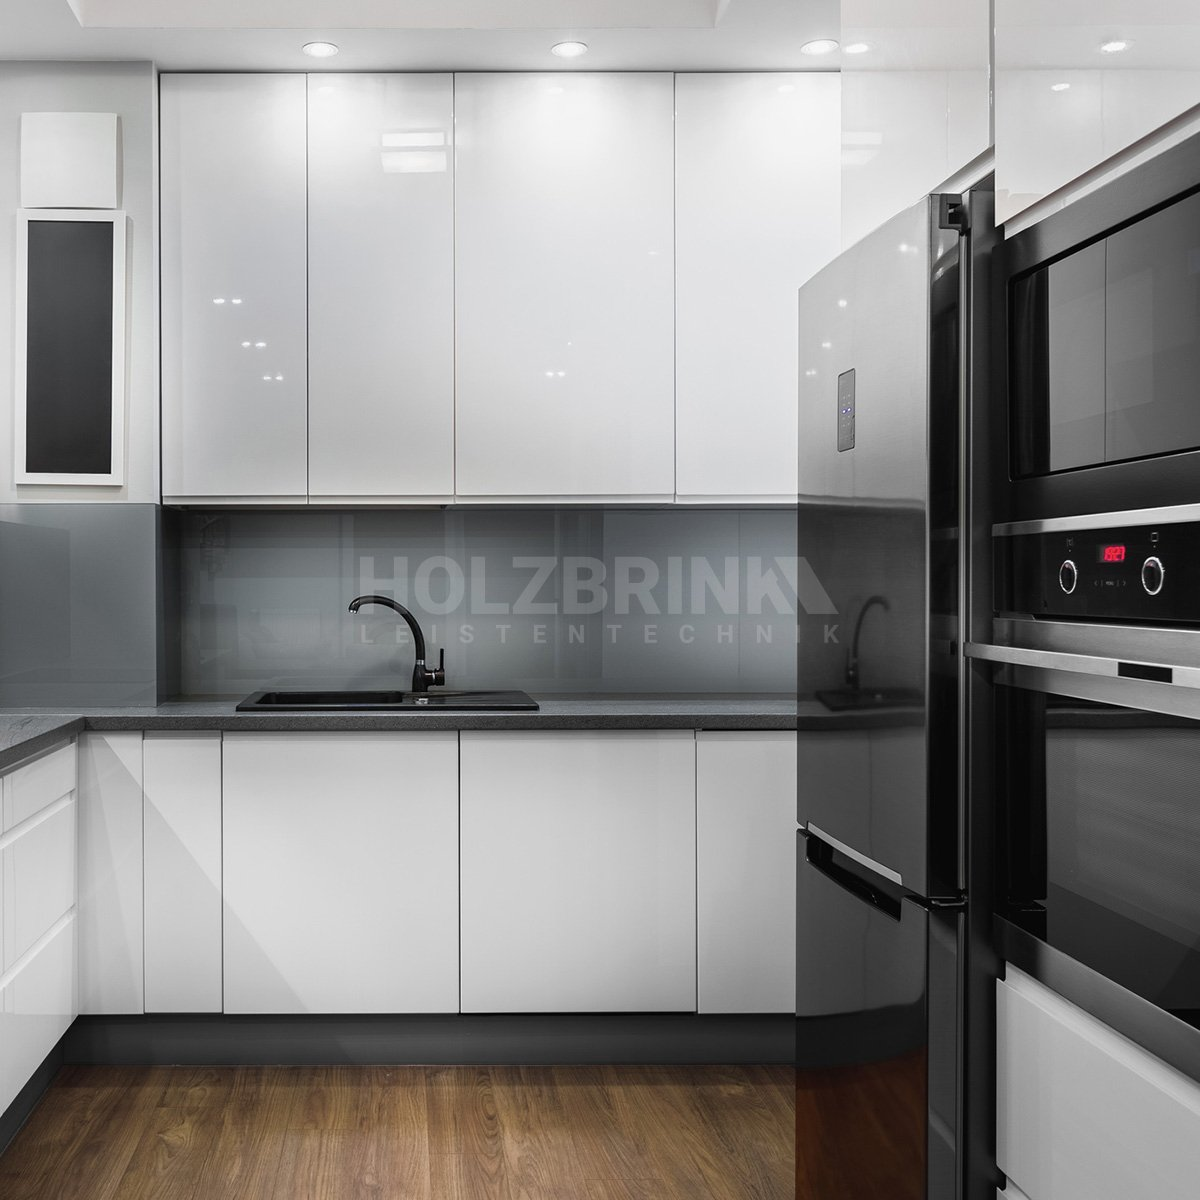 Full Size of Nolte Küche Blende Entfernen Sockelleiste Küche 80 Mm Küche Sockelblende Buche Küchenblende Clips Küche Küche Blende